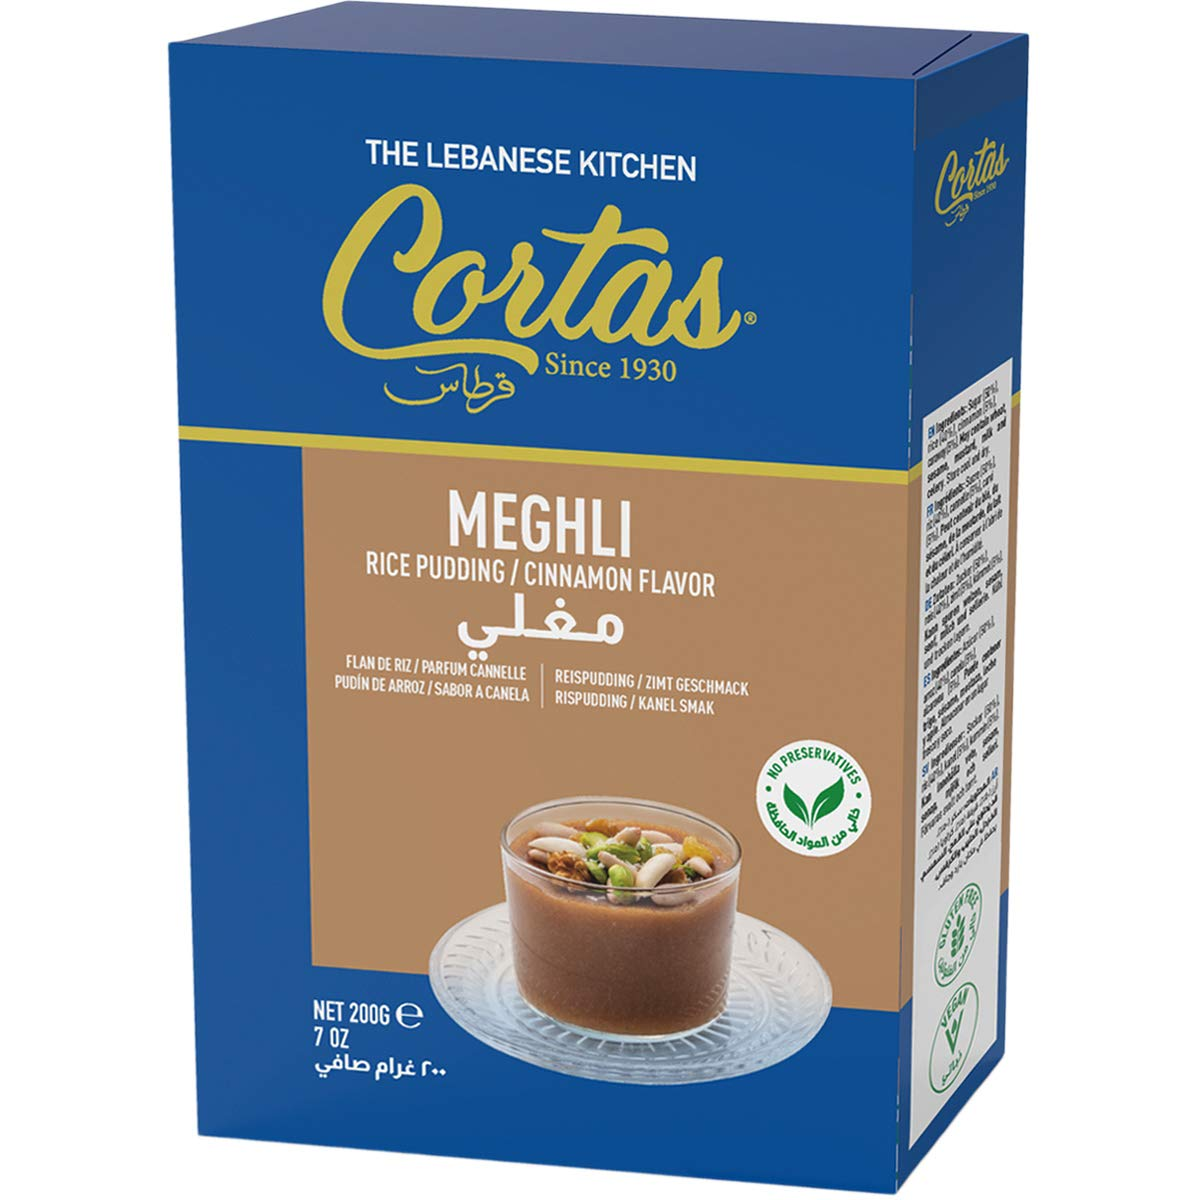 Cortas Meghli Rice Pudding-Cinnamon Flavor 7oz [200g]